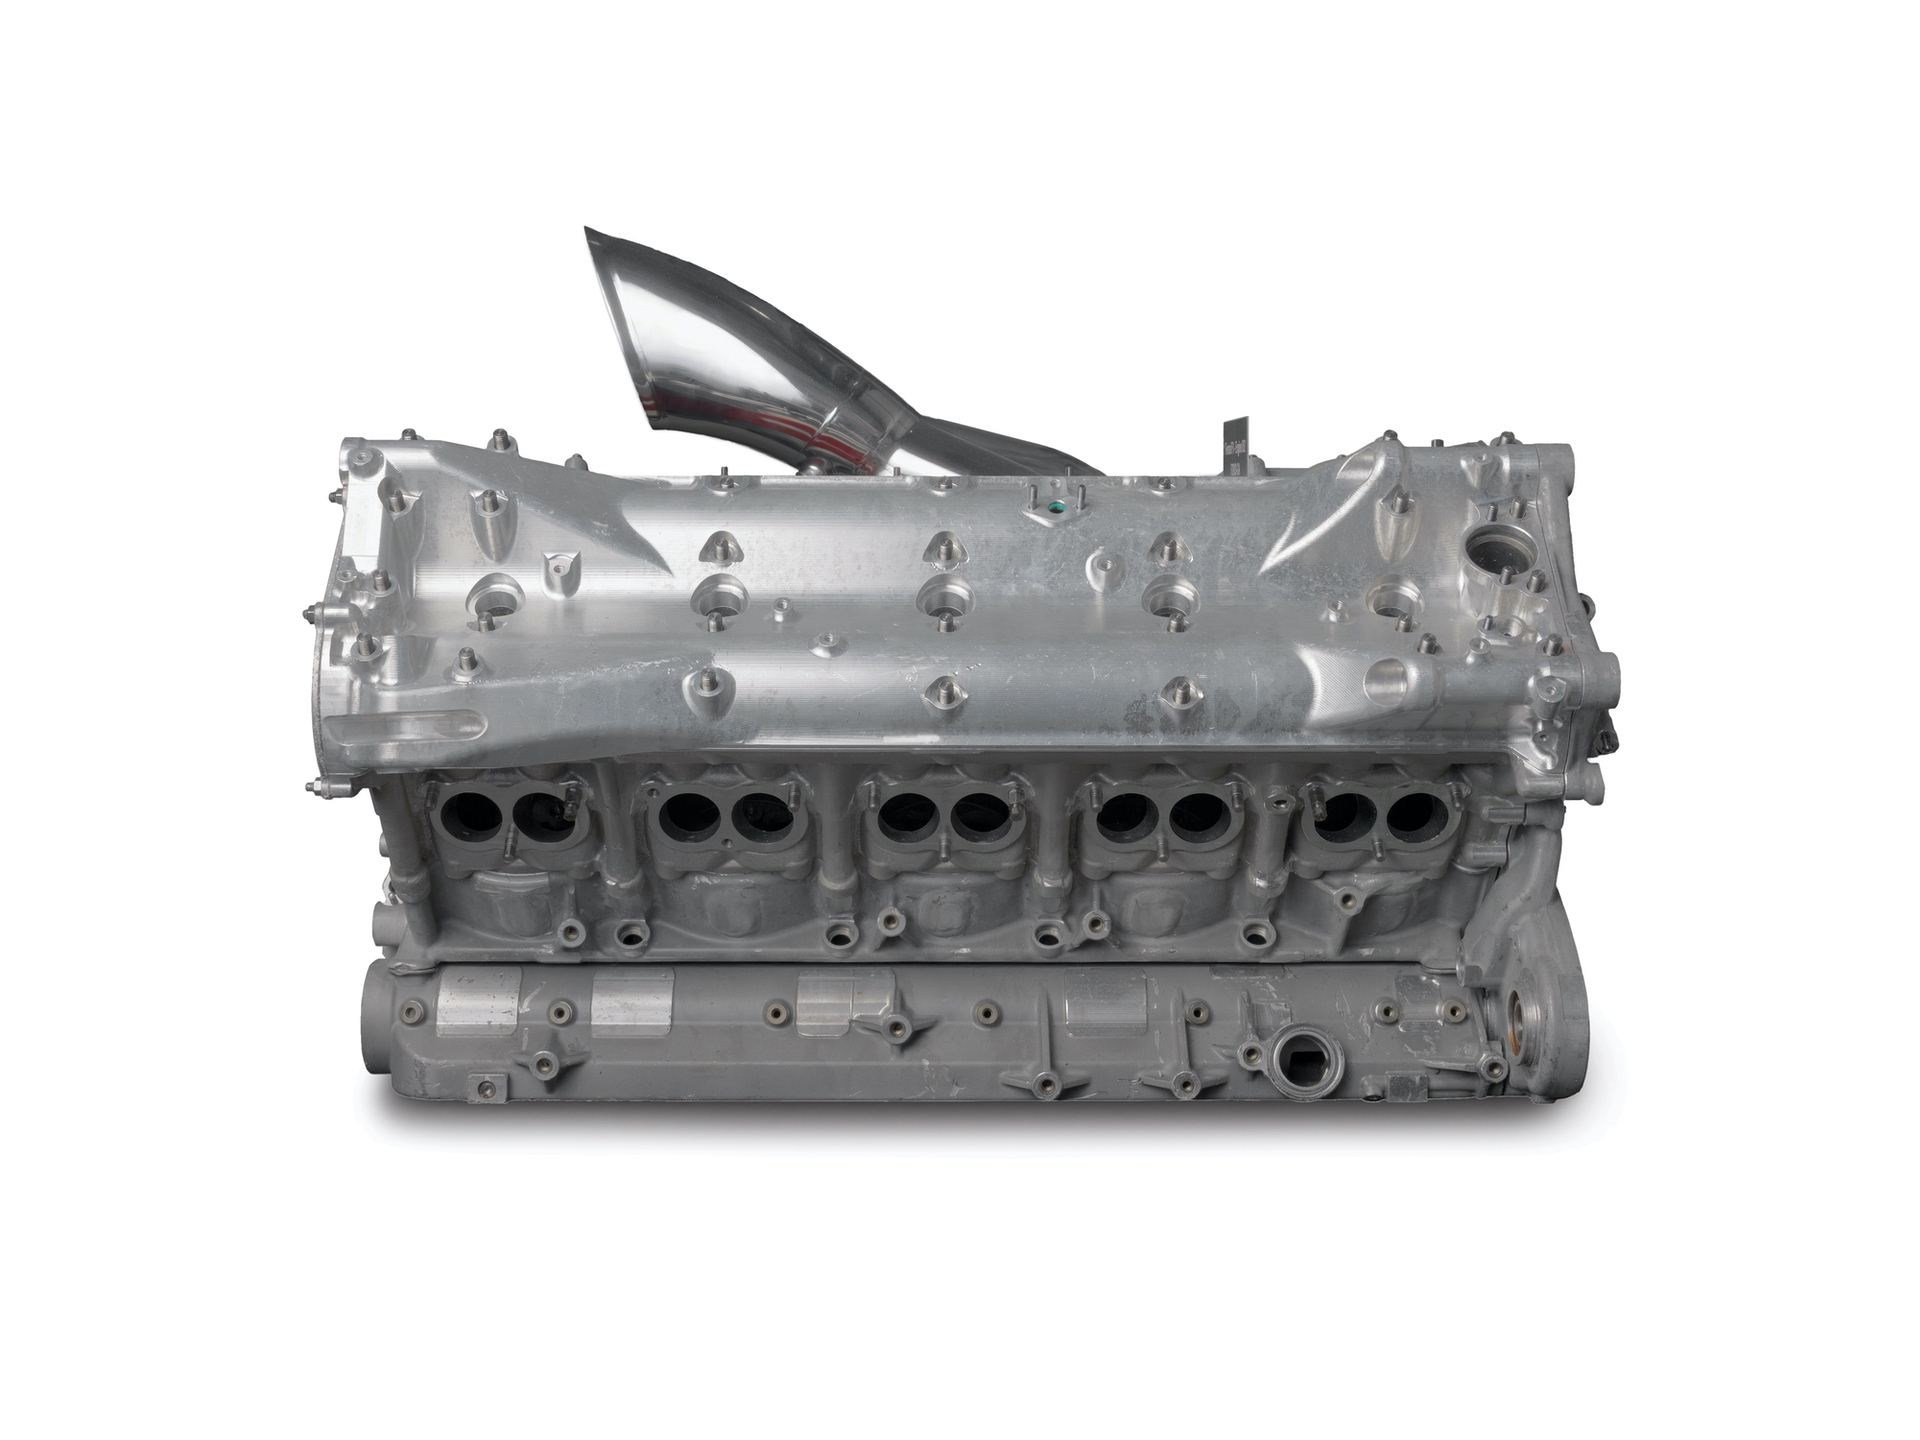 Ferrari_F2003-GA_Engine_0002